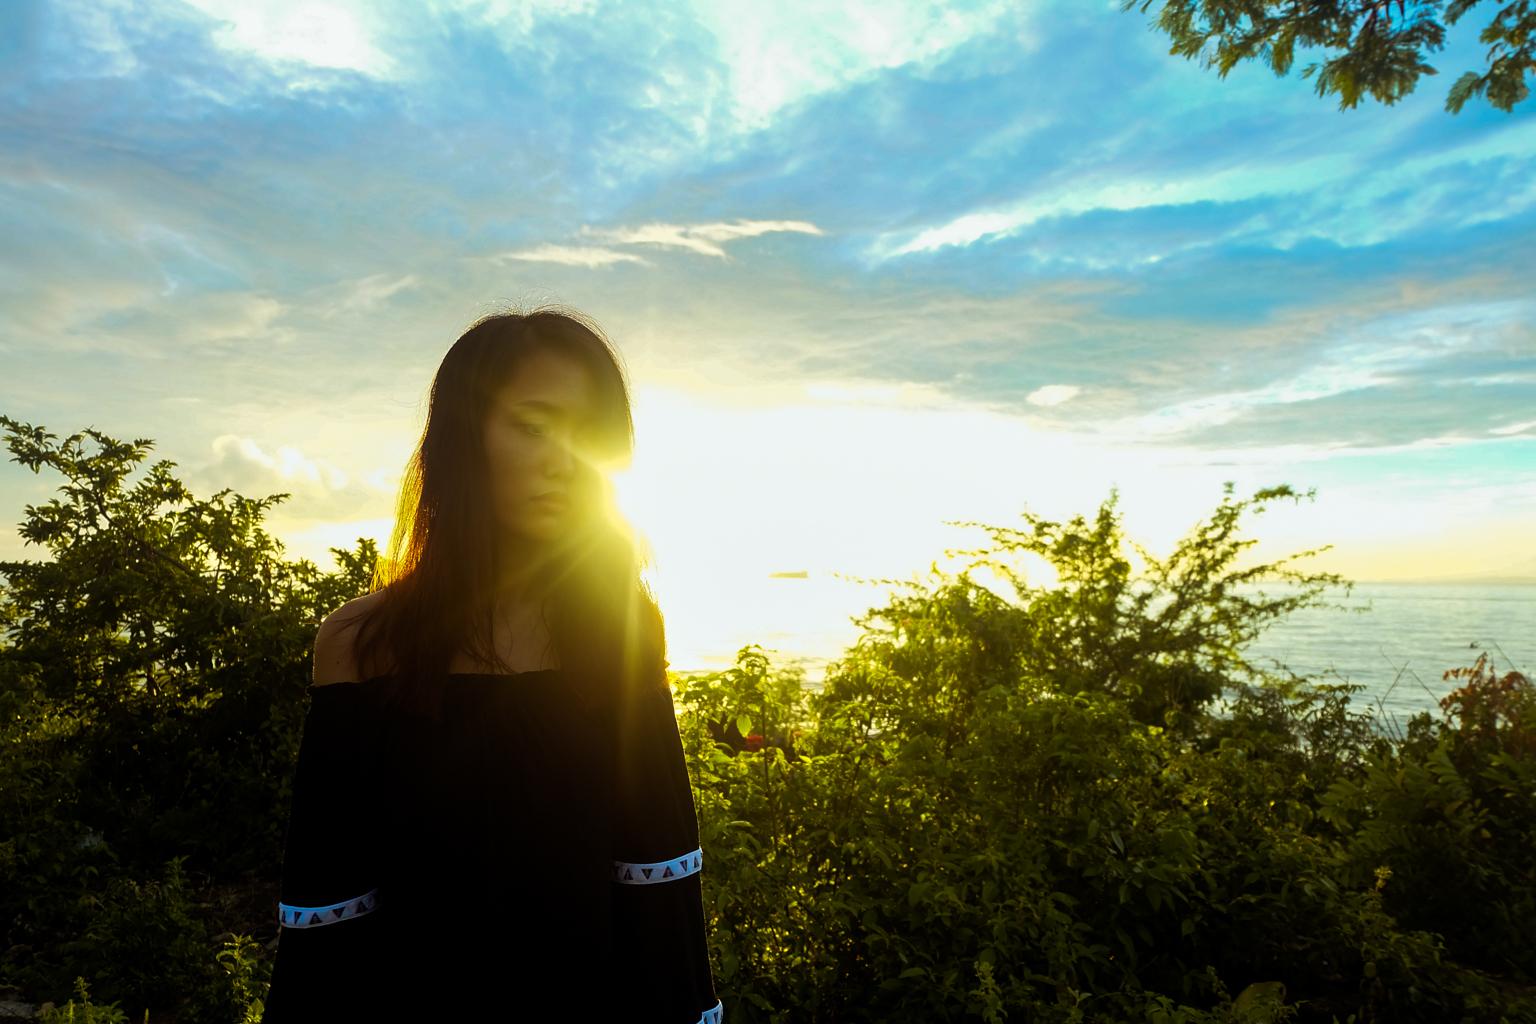 sunrise-at-bagacay-point-lighthouse-liloan-cebu-7